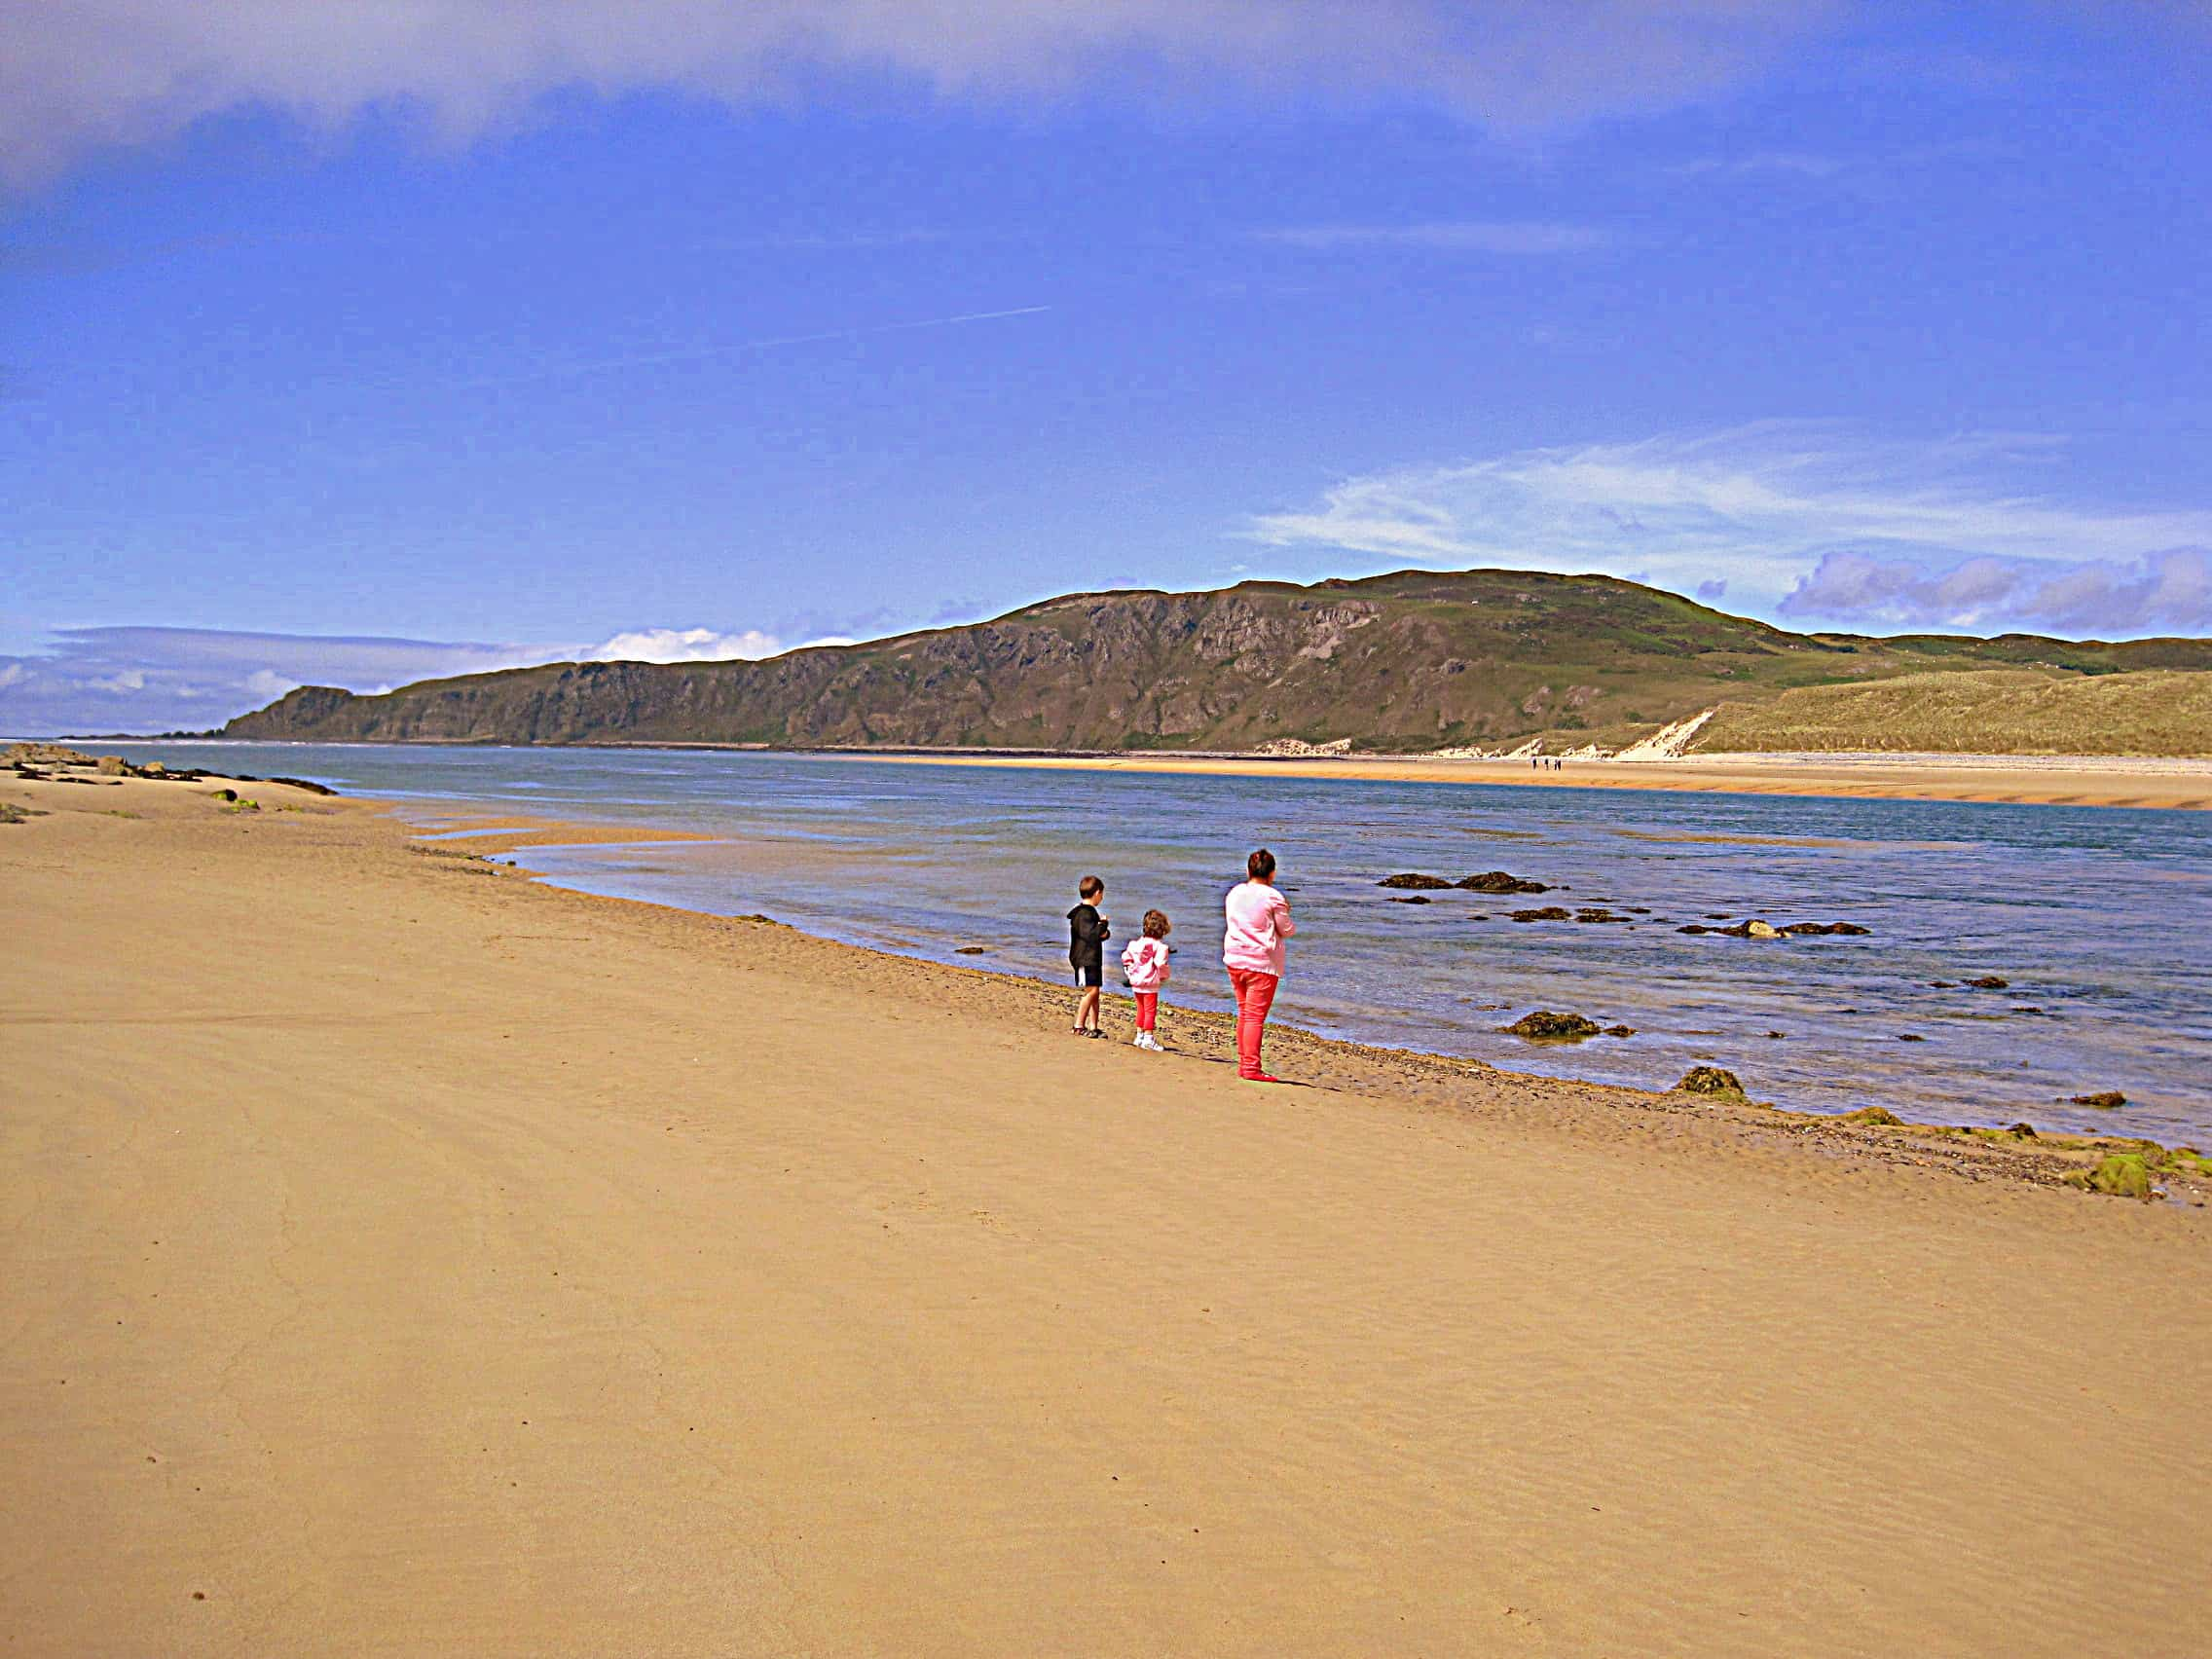 Doagh Beach On The Inishowen Peninsula